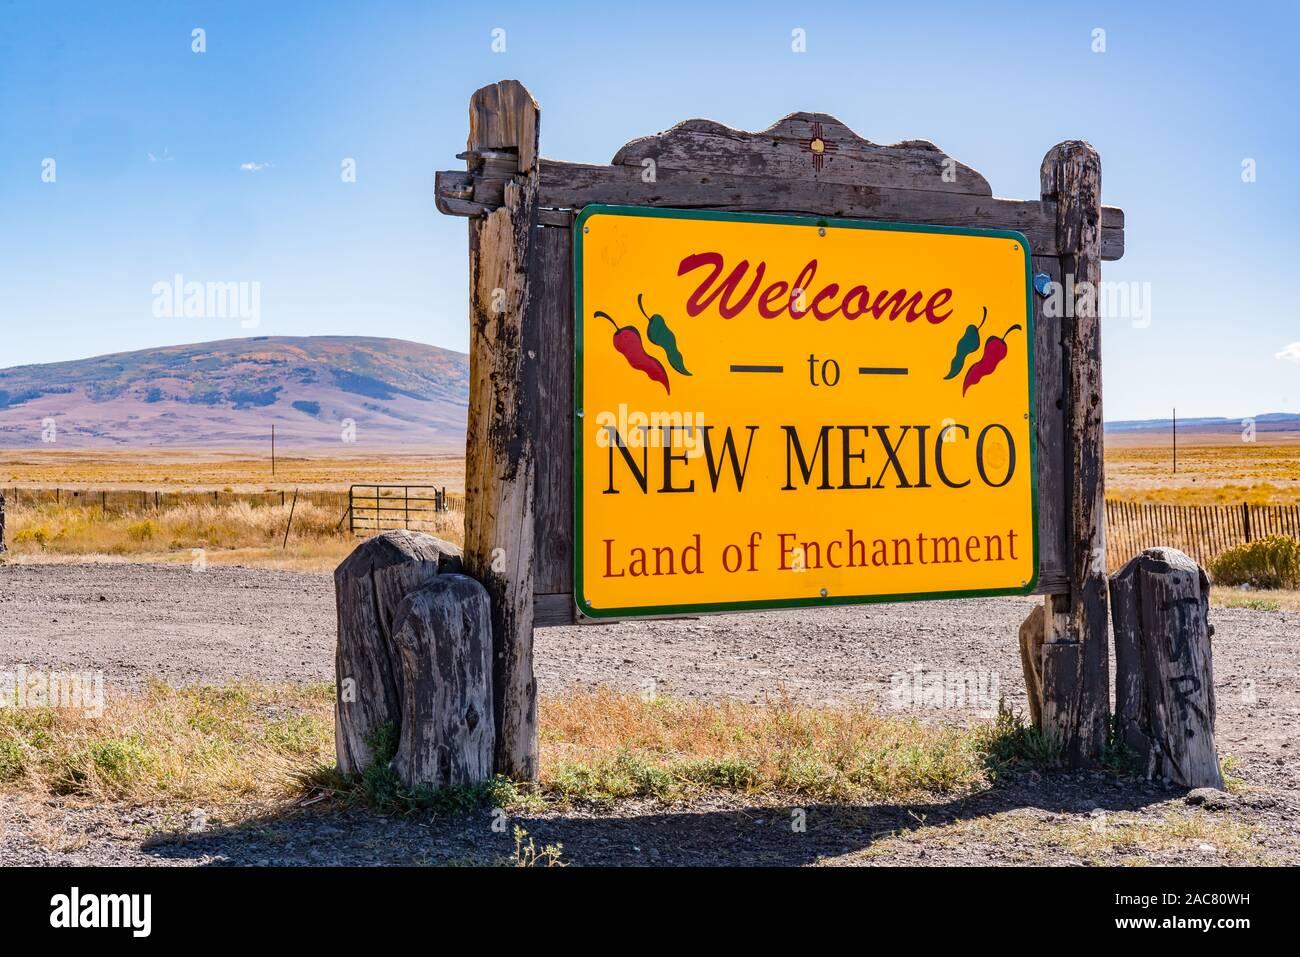 Antonito, CO - October 3, 2019: Welcome to New Mexico Sign near the Colorado - New Mexico Border Stock Photo